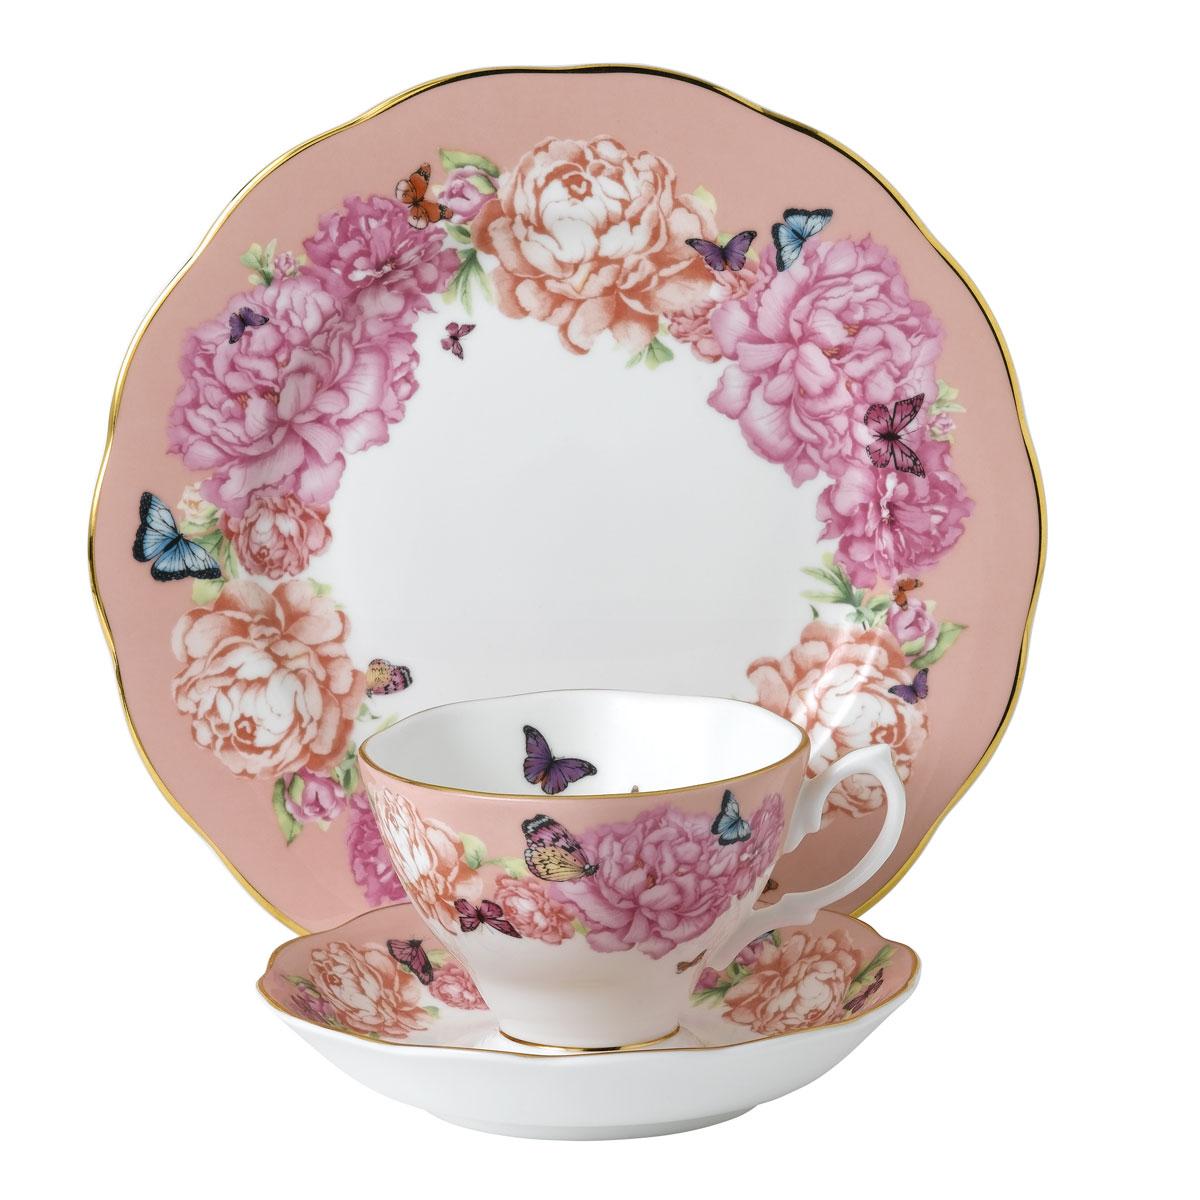 "Royal Albert Miranda Kerr Friendship 3pc Set Teacup, Saucer and Plate 8"" Hope, Coral"